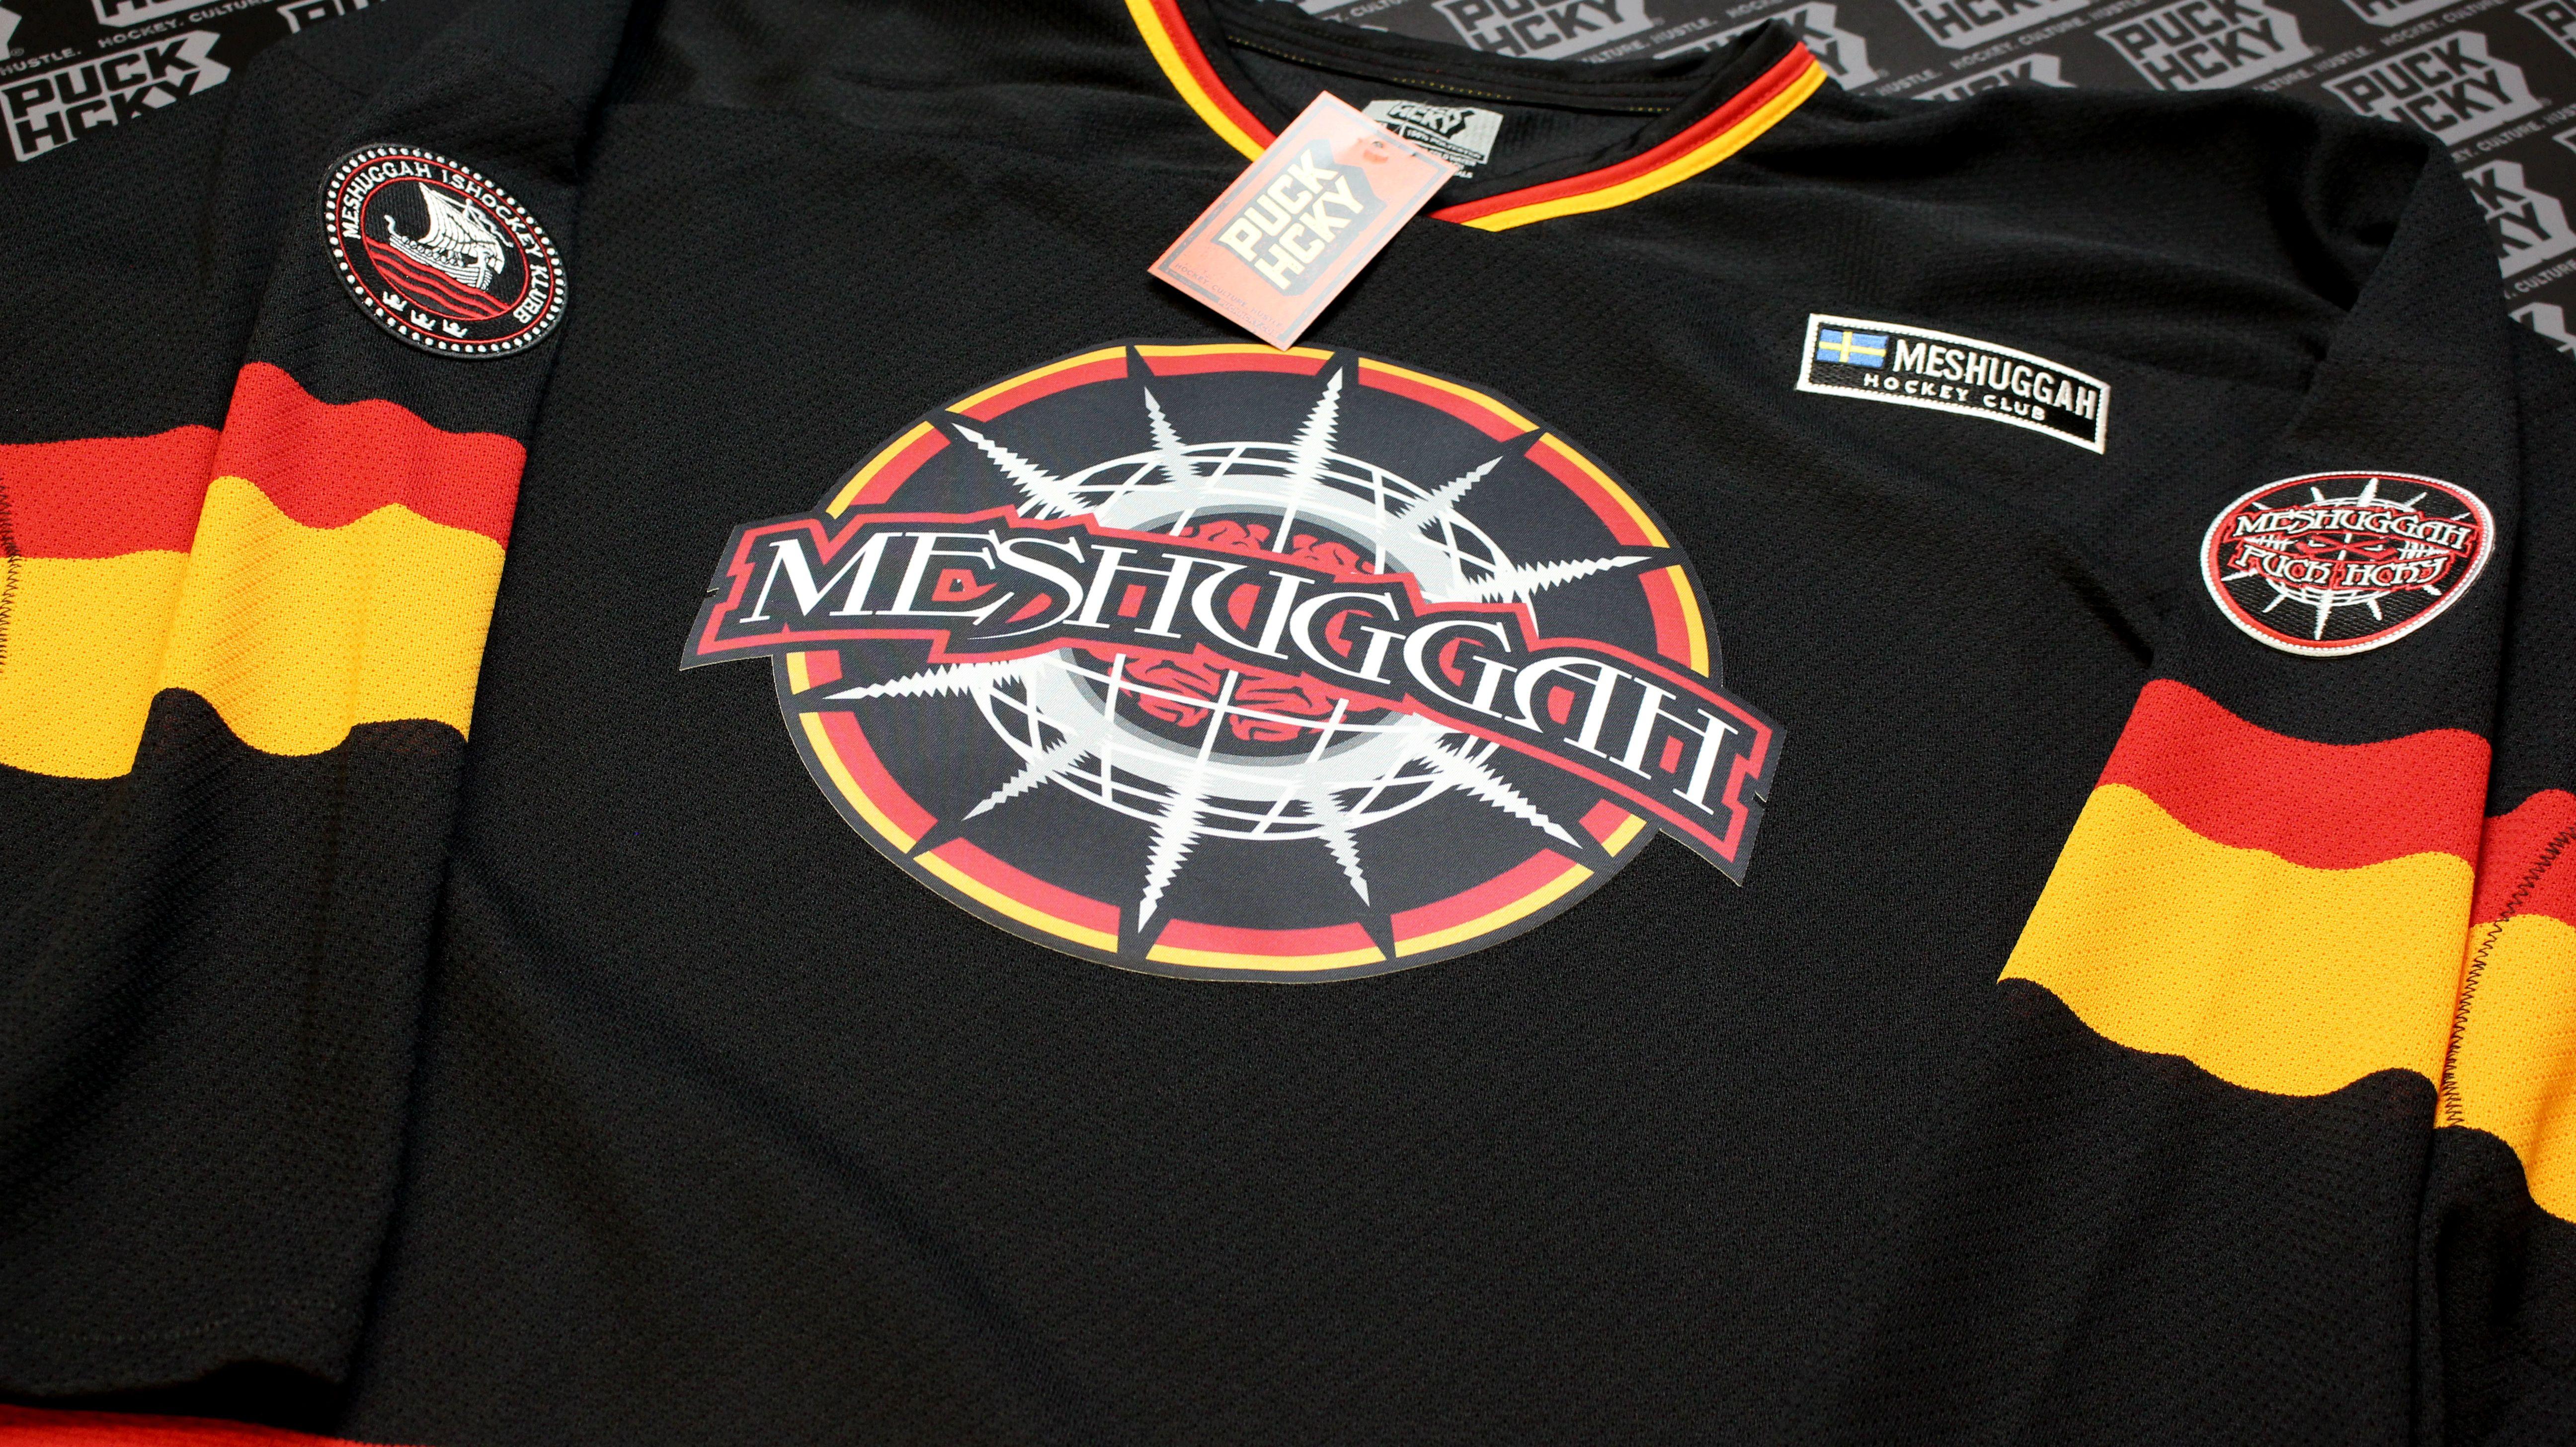 Meshuggah 'chaosphere' hockey jersey How to wear, Hockey